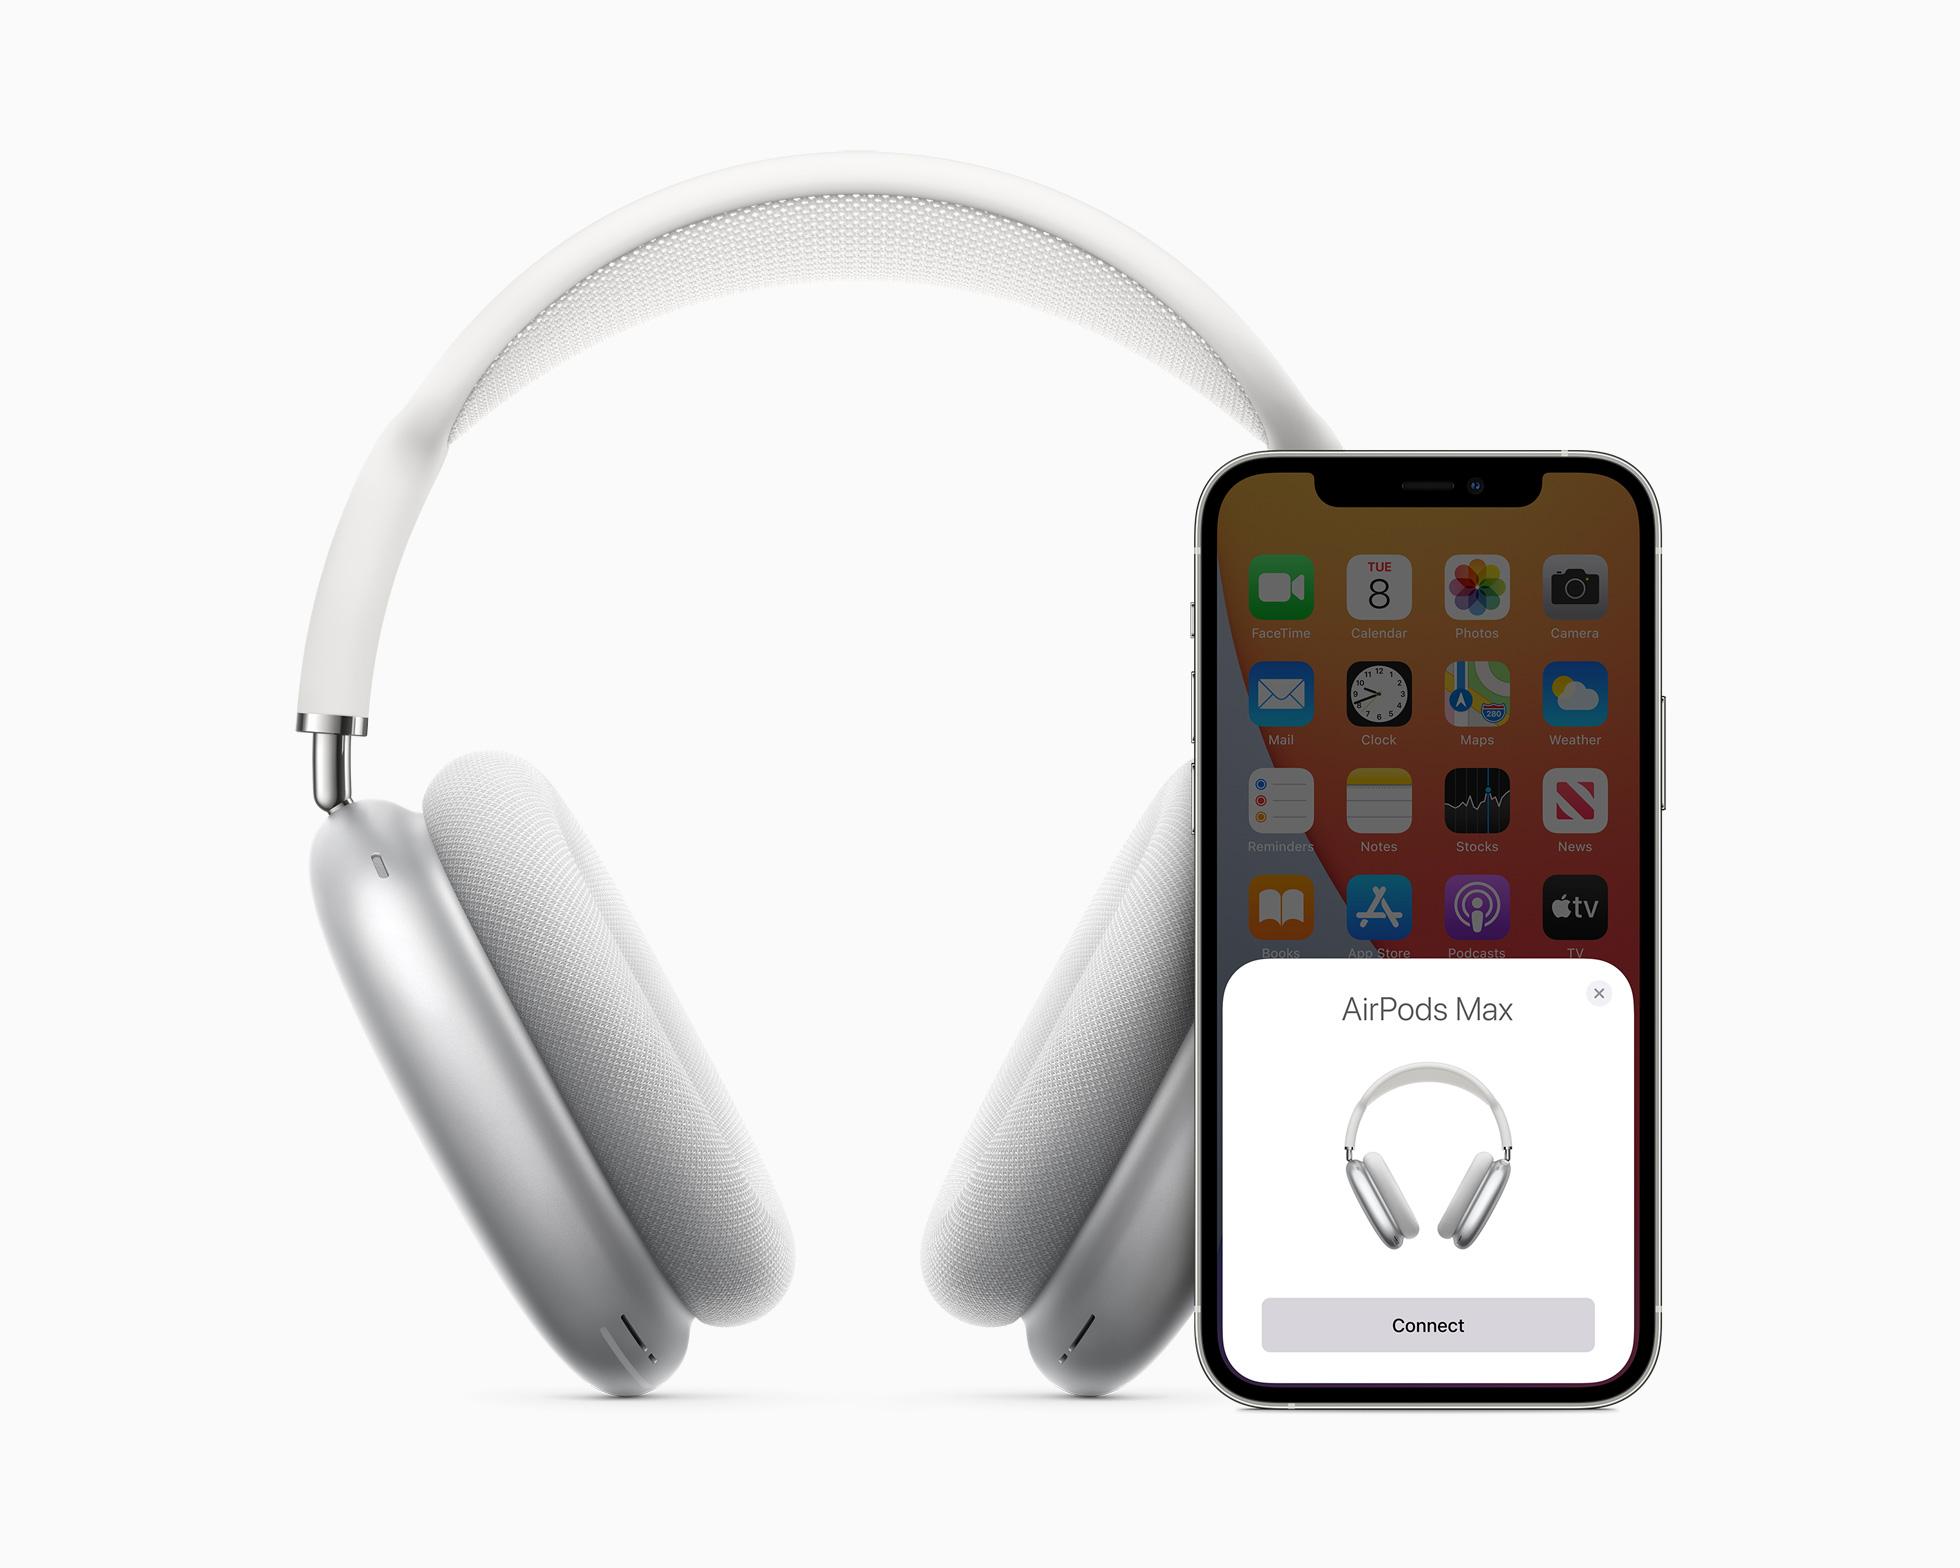 Apple Air Pods Max